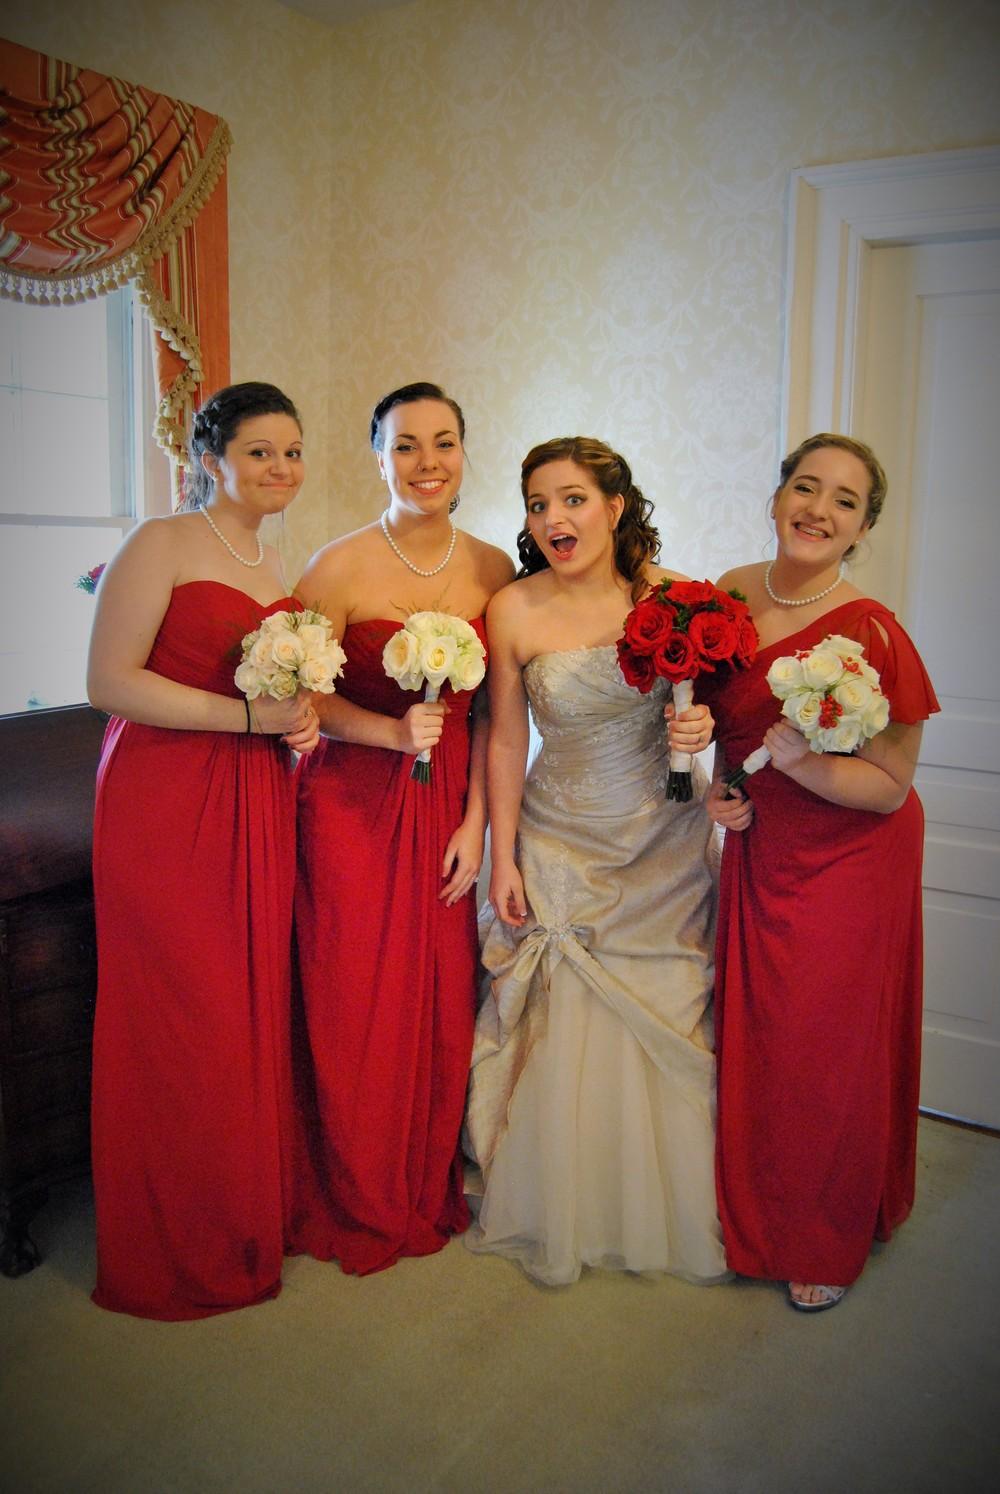 Rowsey-wedding-bridesmaids.jpg